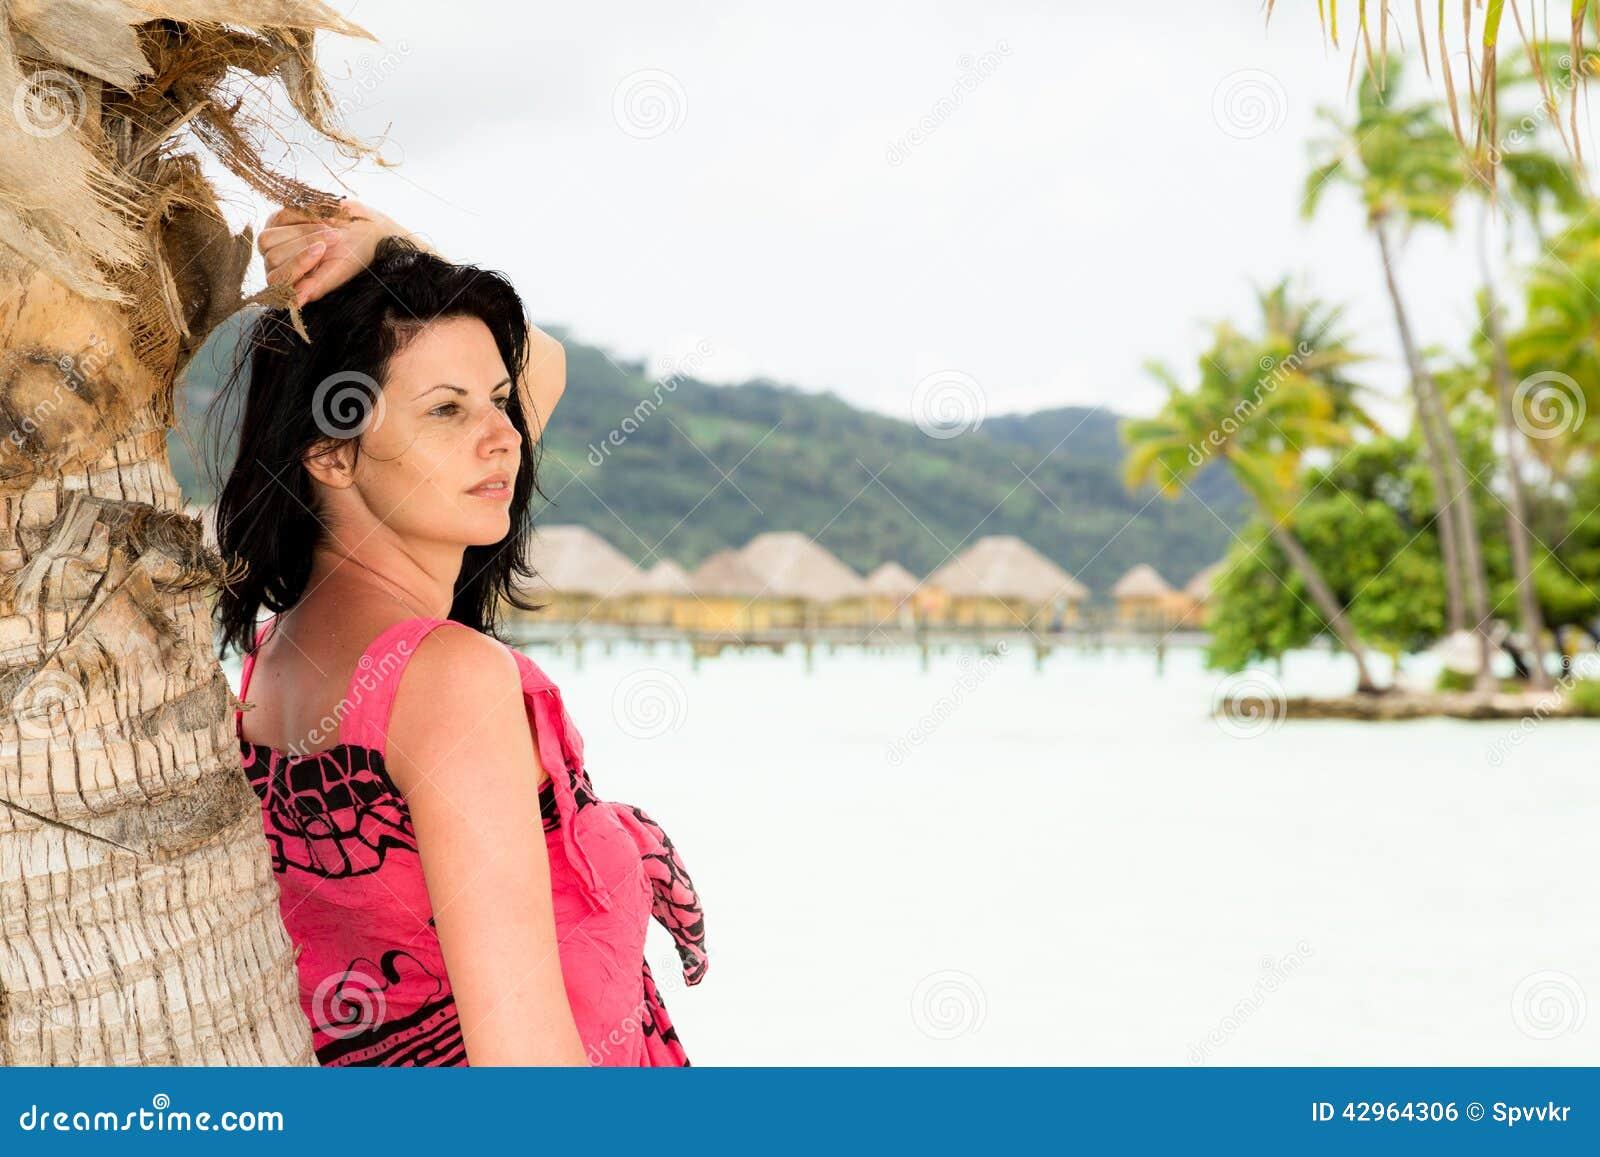 Exotic bbw island girl has fun with a big white cock - 1 10